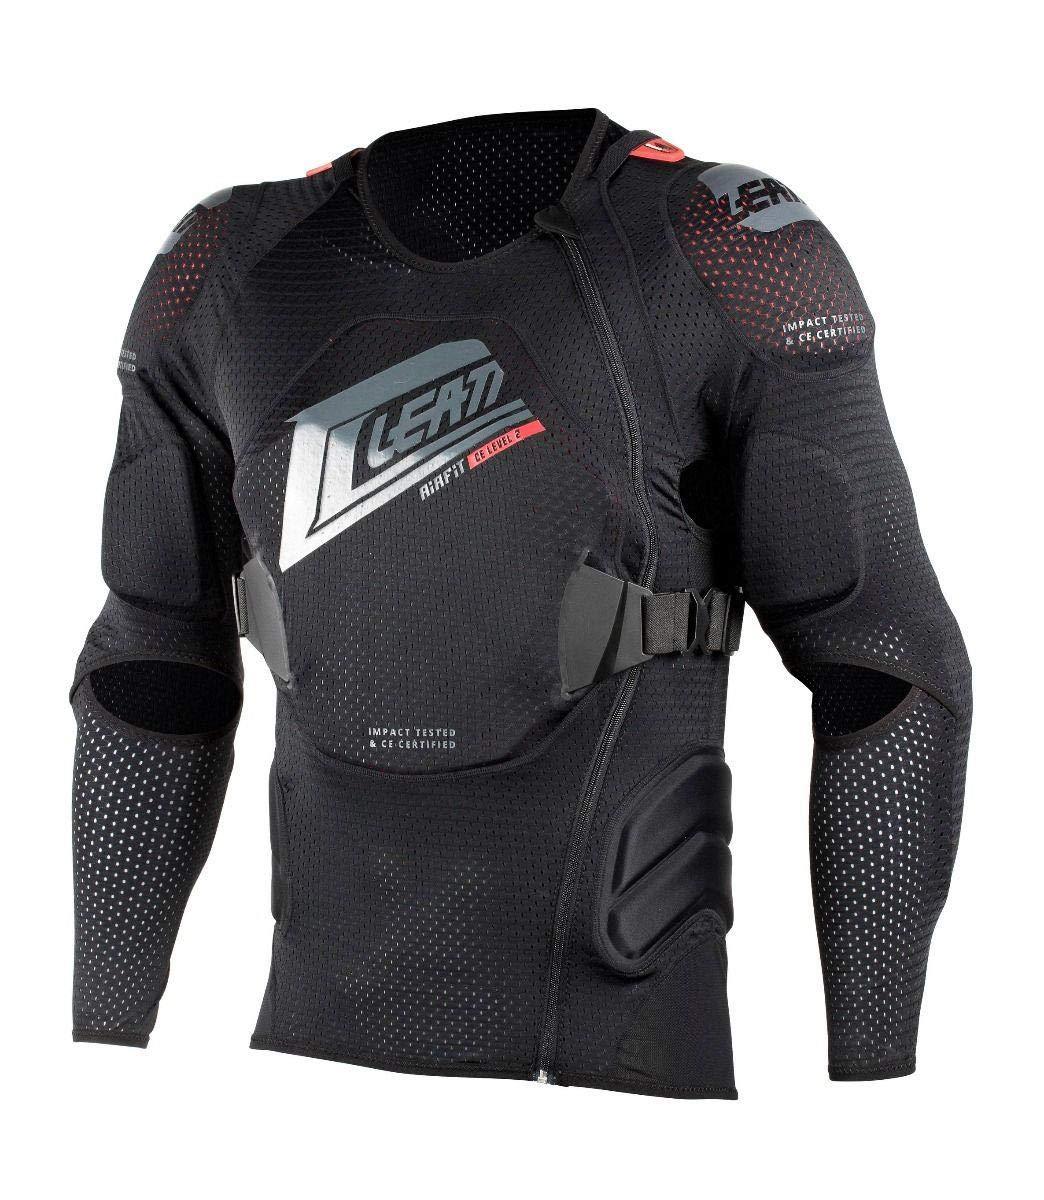 leatt 3df airfit lite nero 2019  5018101212 - Leatt 3DF AirFit Body Protector L/XL Black ...